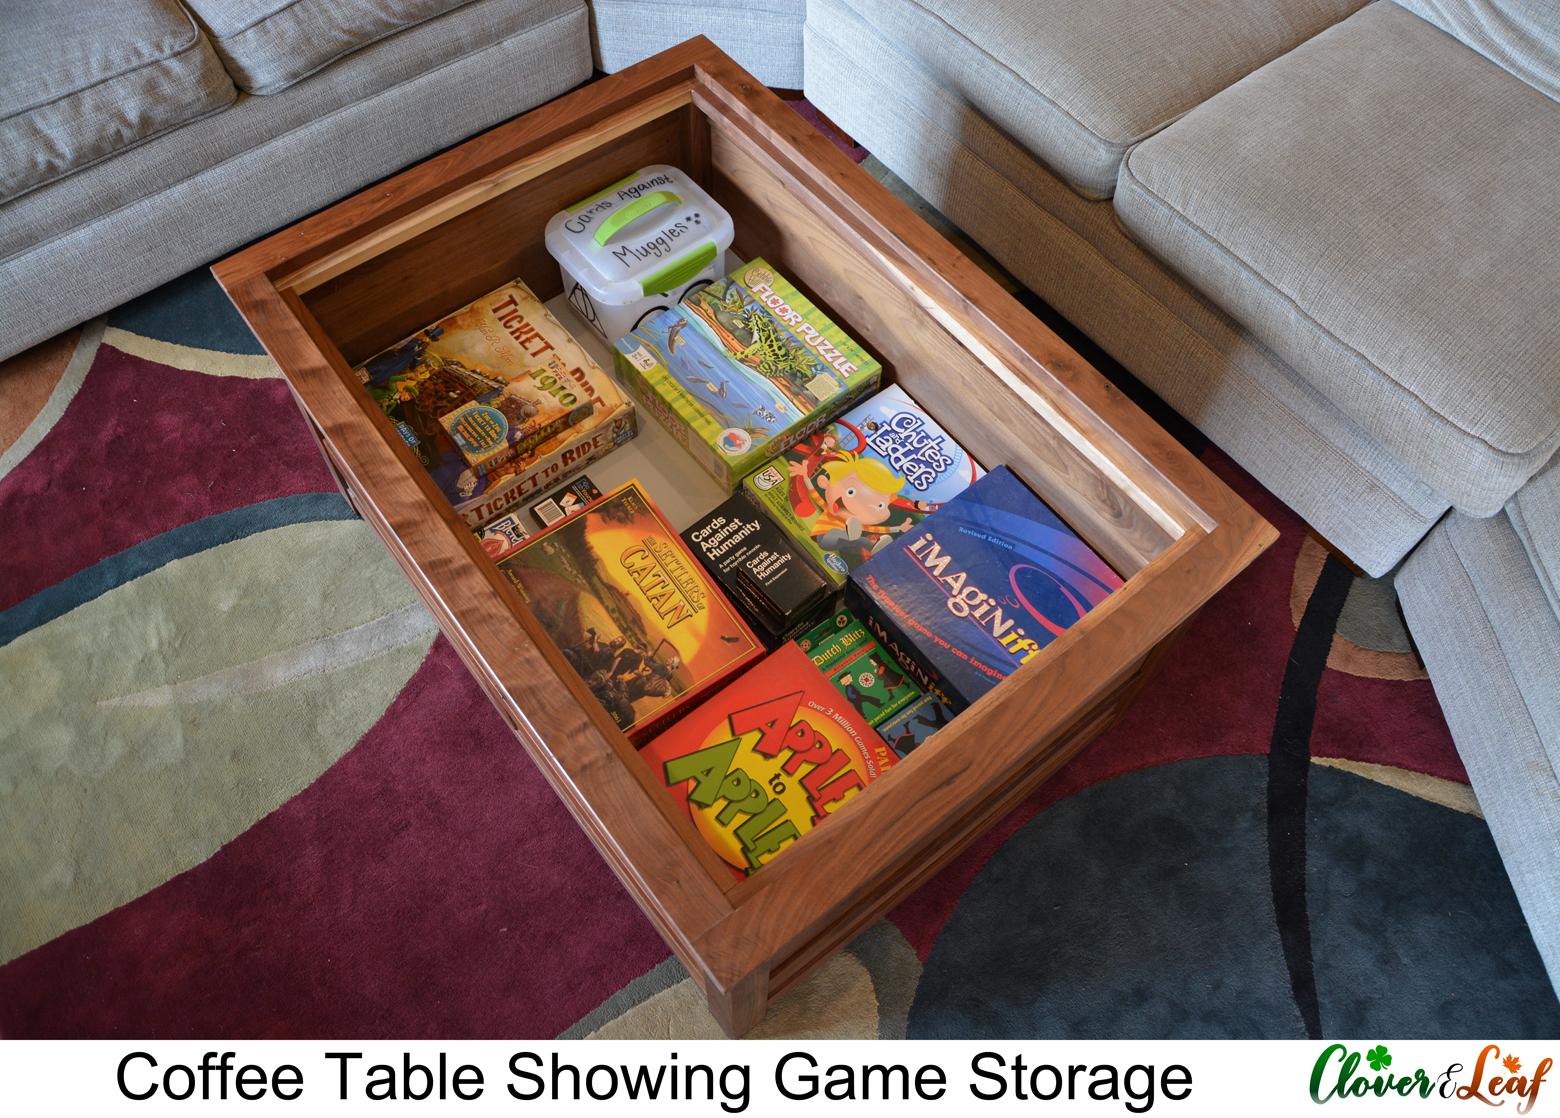 Coffee Table Showing Game Storage 2.jpg